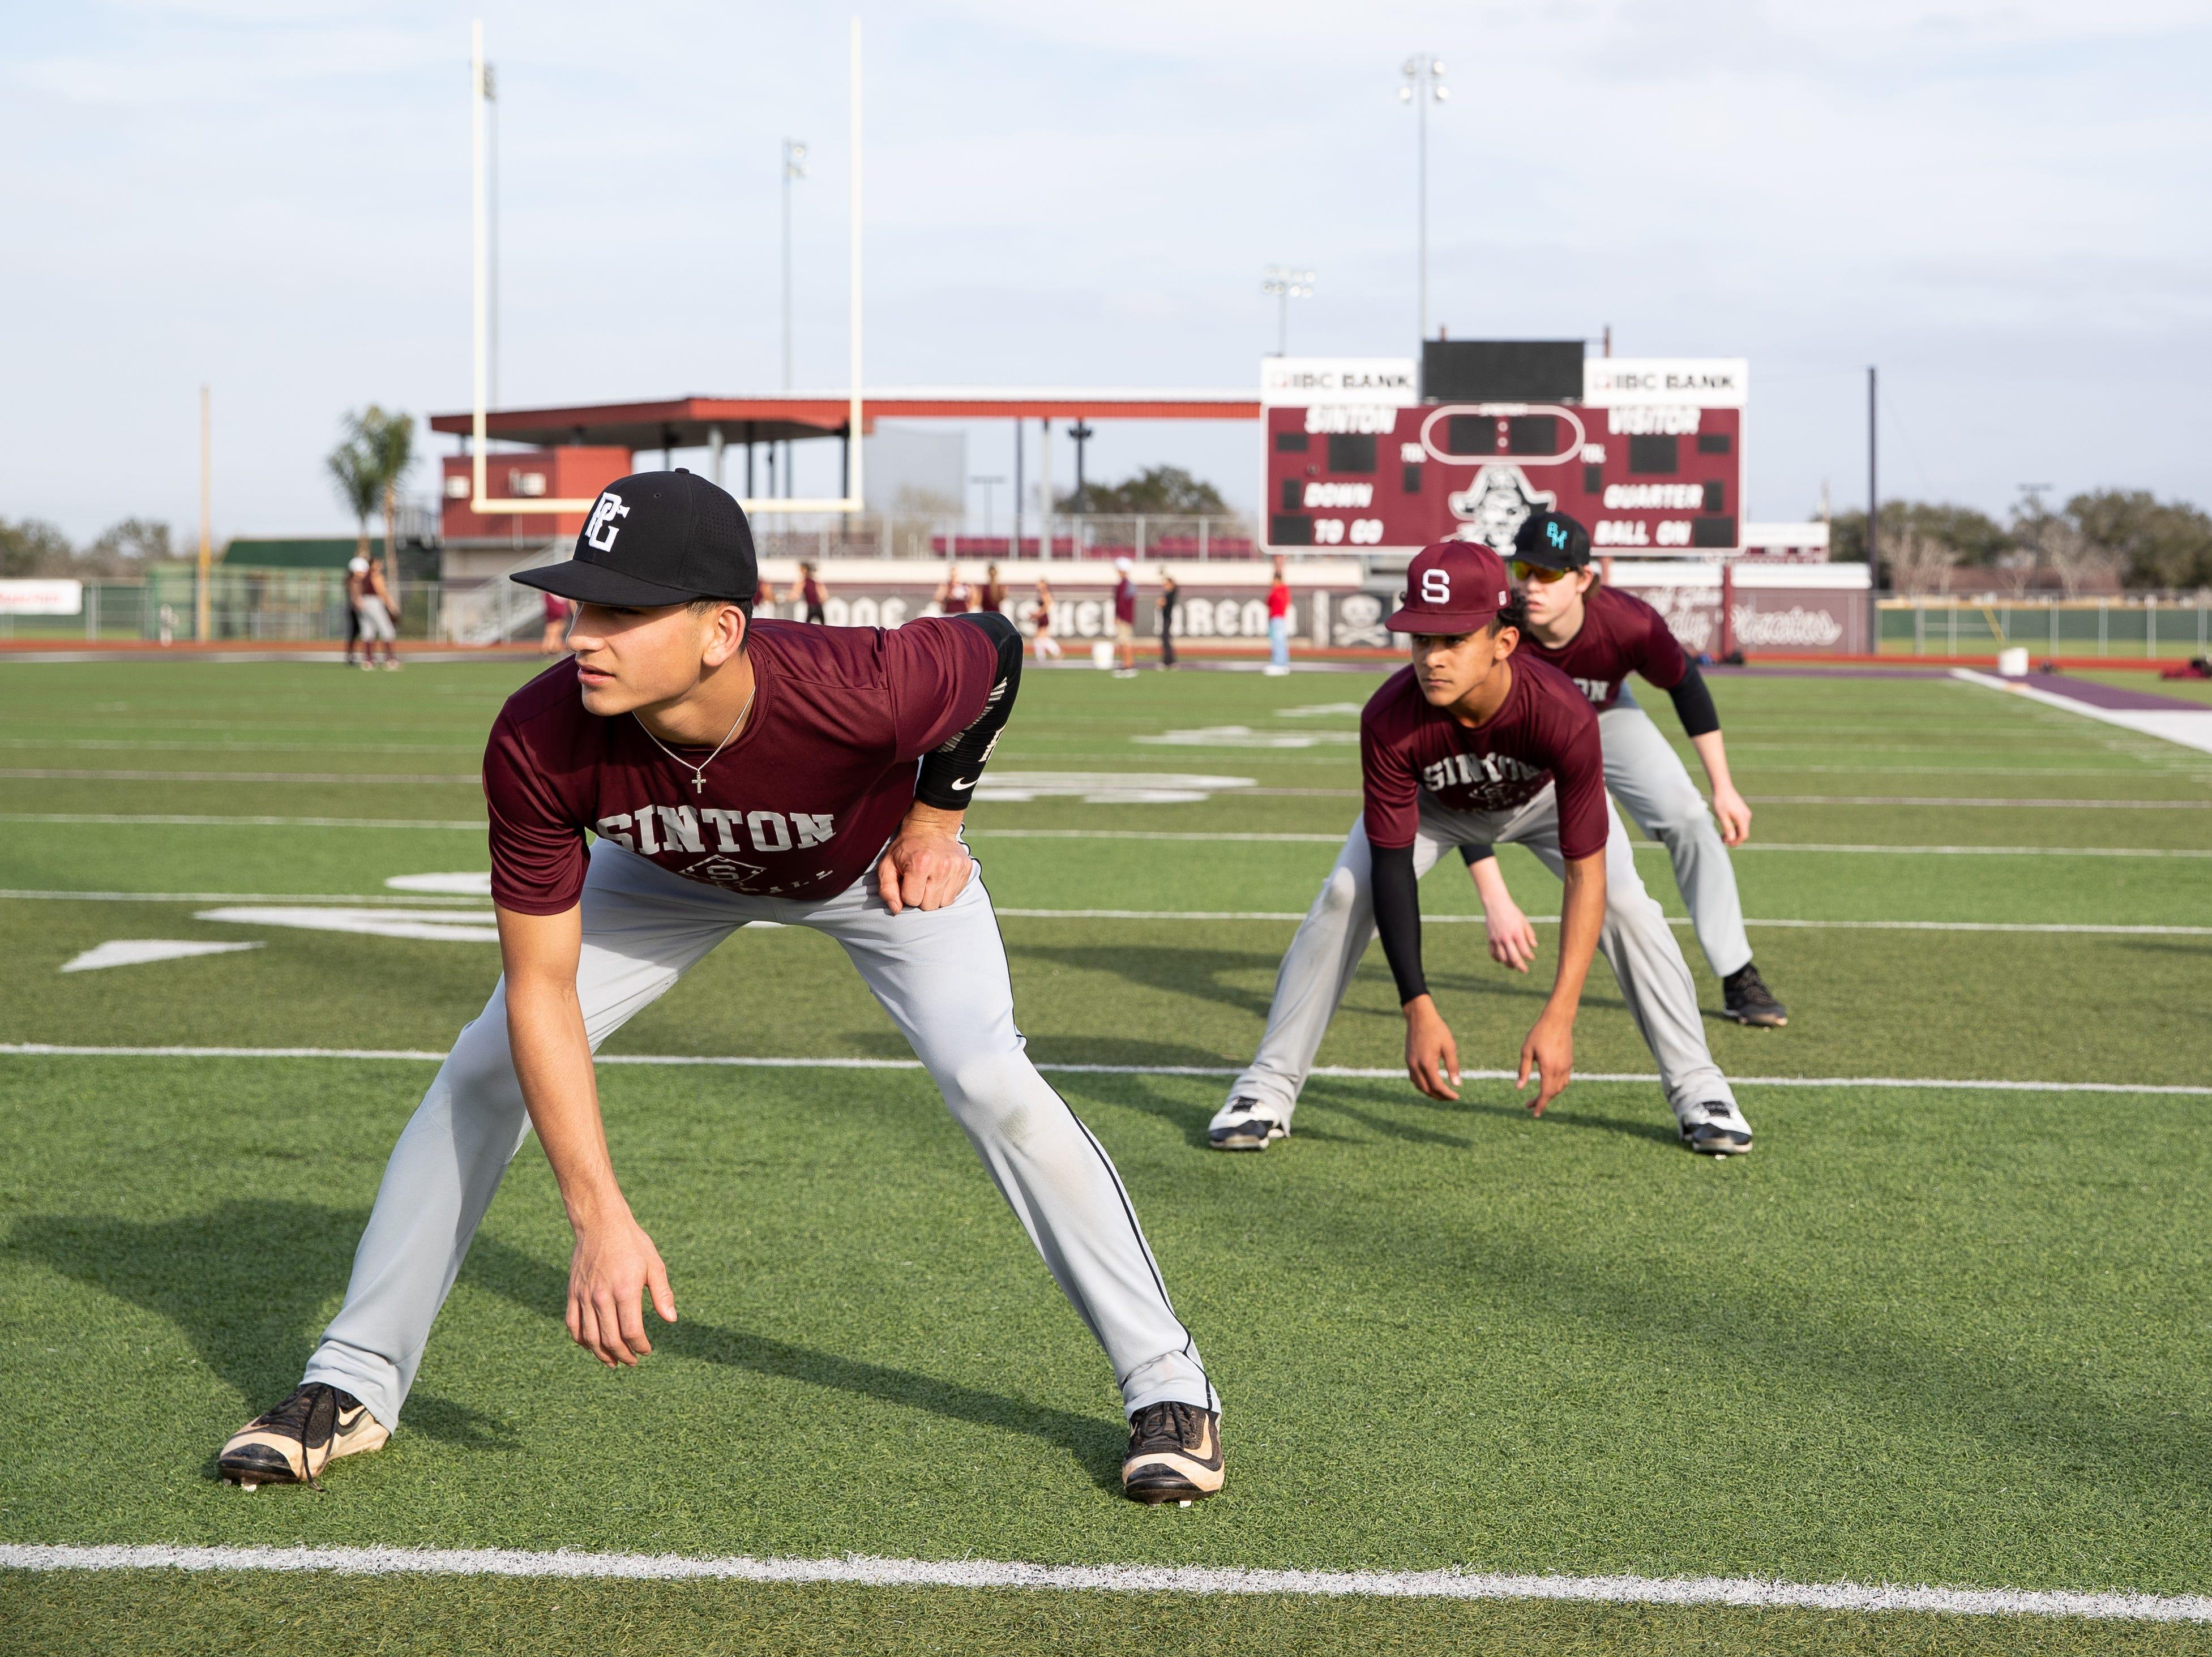 Sinton High School baseball team does base running drills during practice on Friday, Feb. 1, 2019.